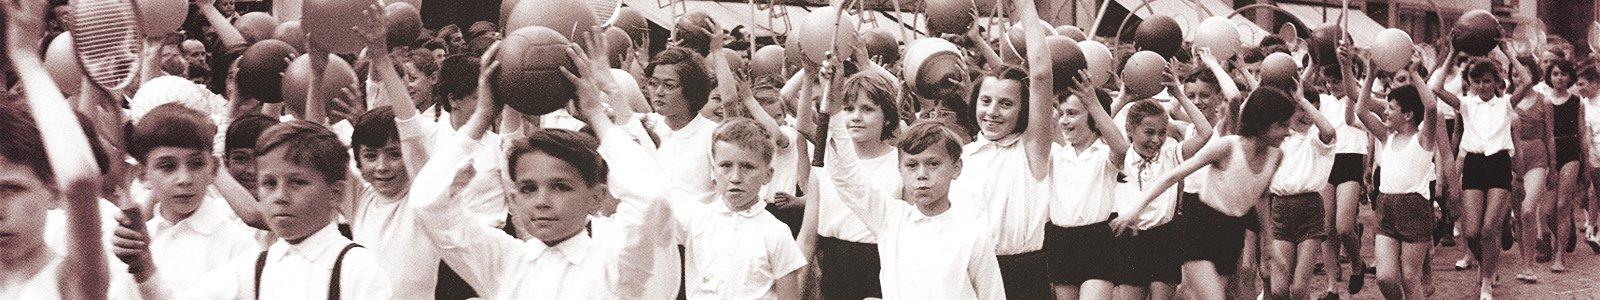 1961 Youth Day in Maribor - Wikimedia Commons/Dragiša Modrinjak